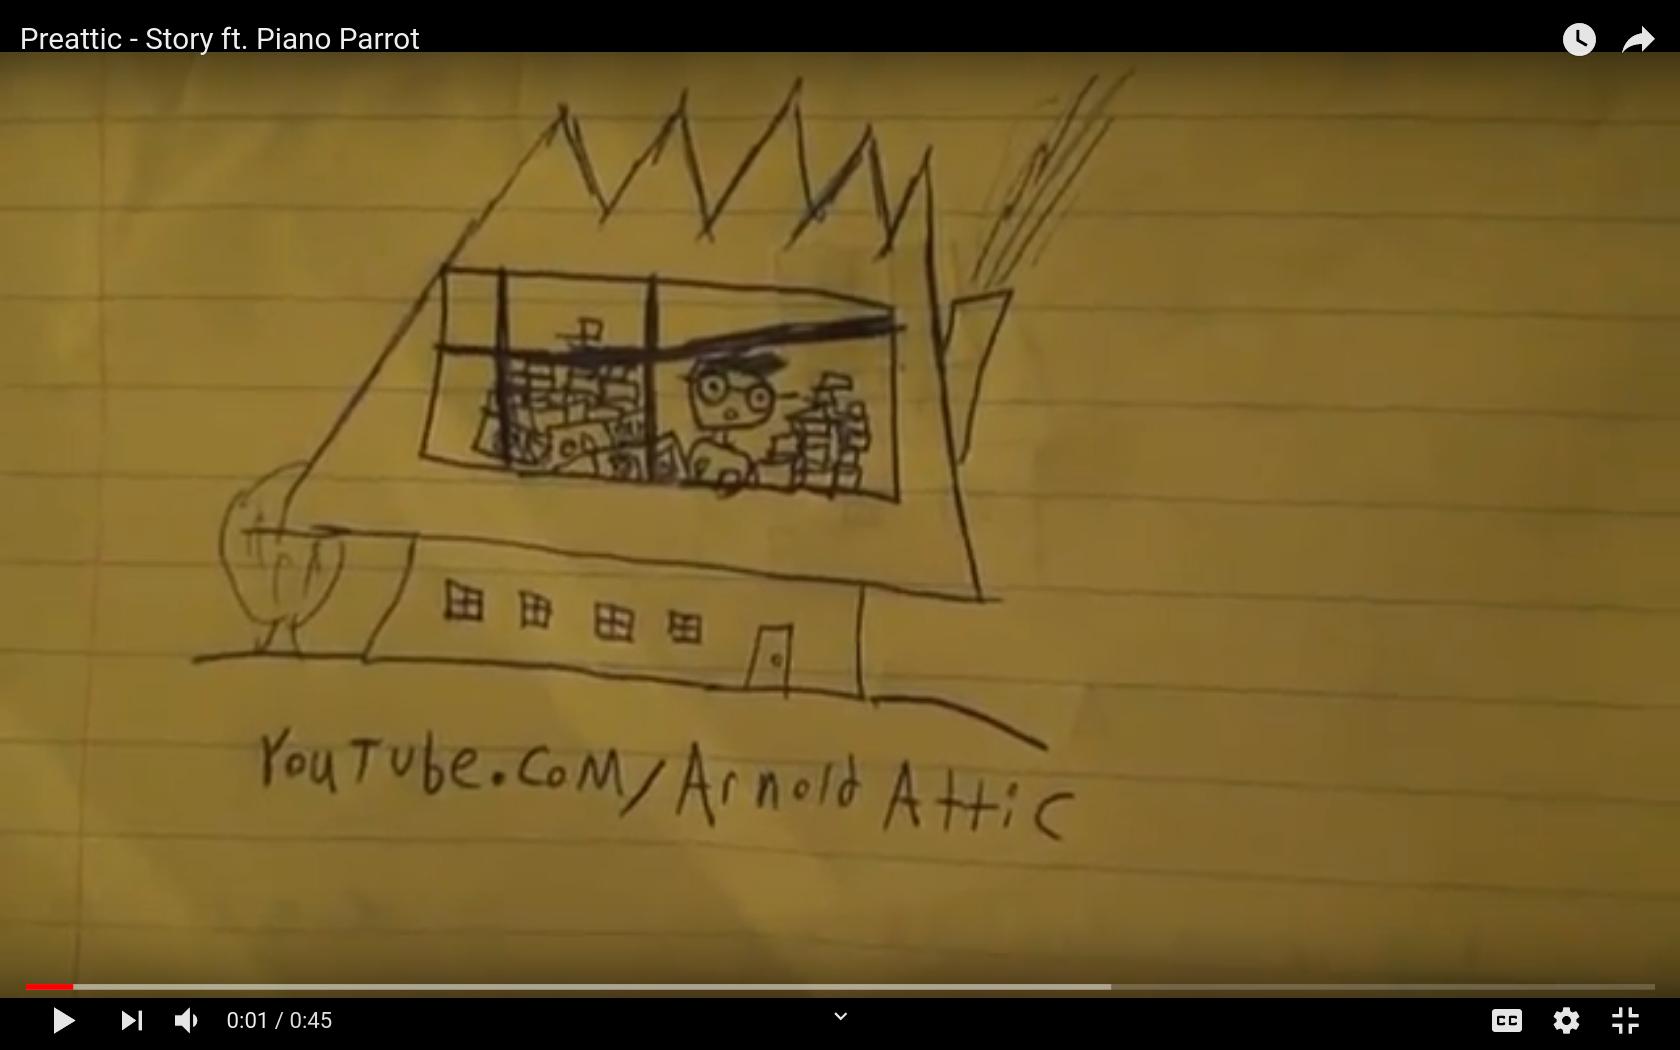 2010-10-16 - Arnold Attic Trailer Screenshot at 2020-03-26 20:12:18.png